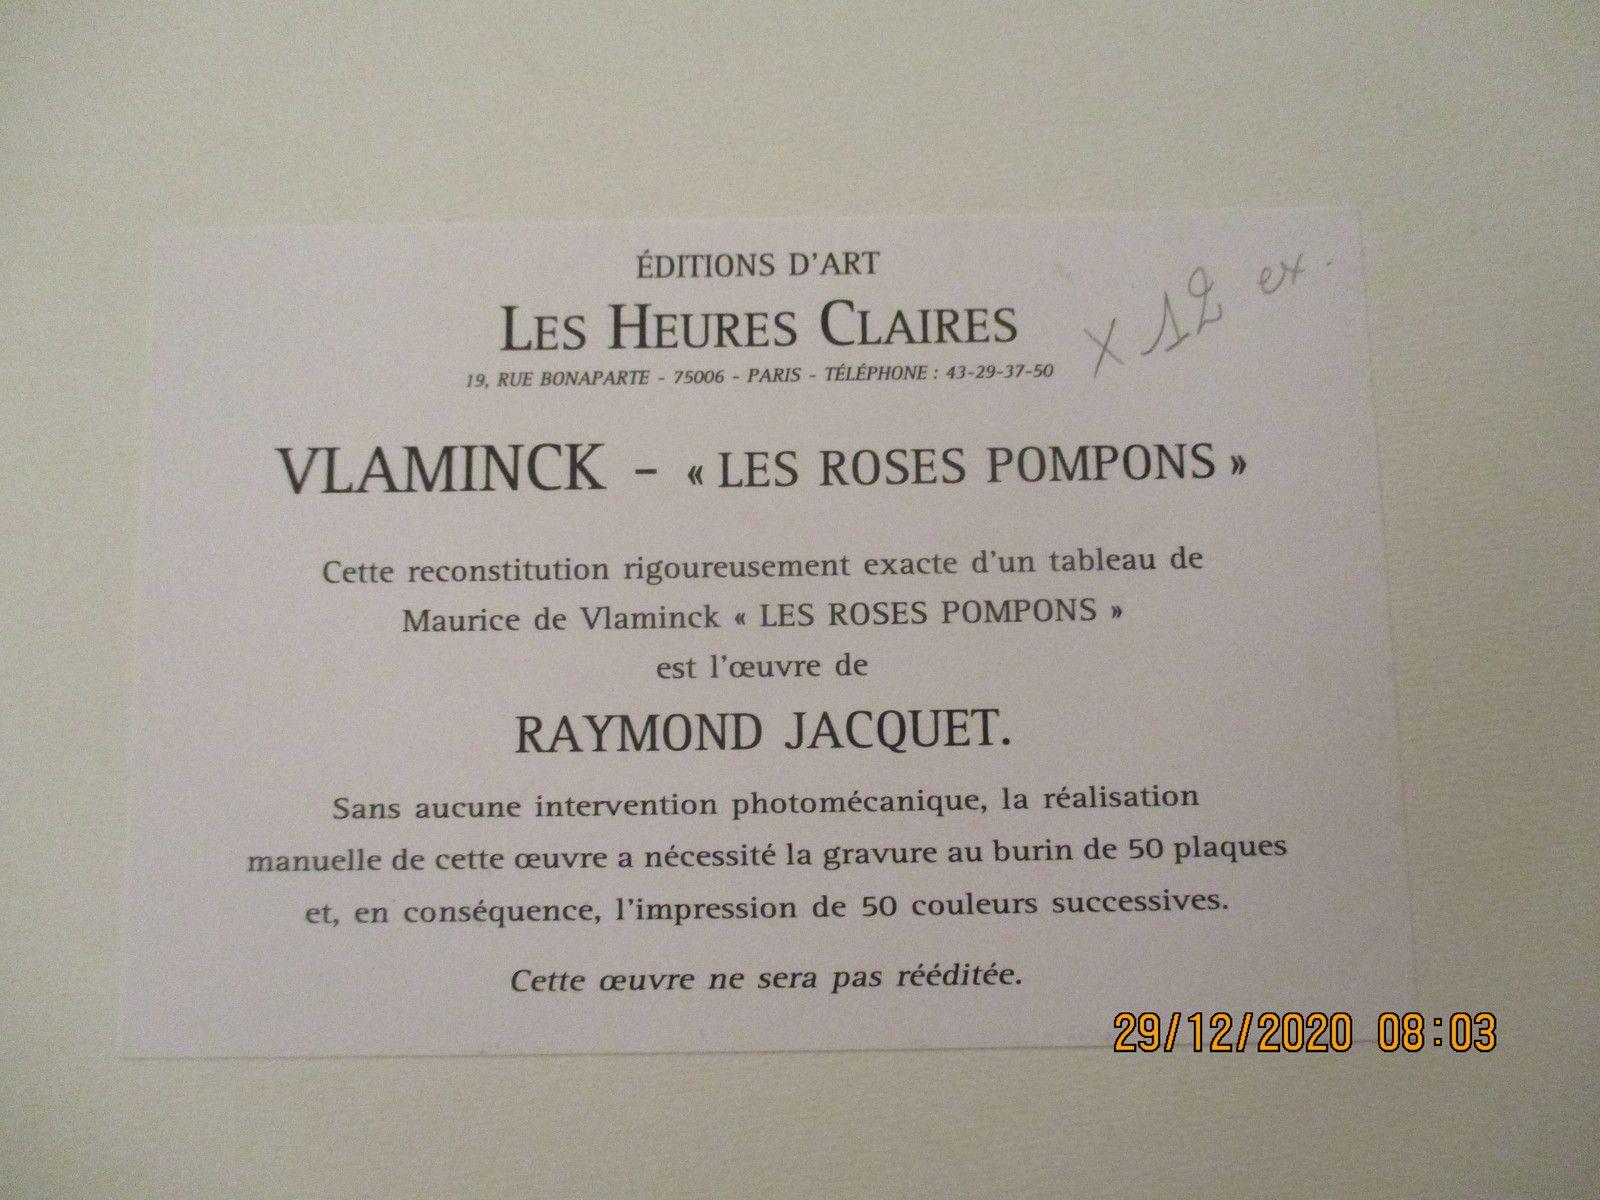 les roses pompons de VLAMINCK  livre de 12 planches etat neuf  prix 680€ +port 15€ en recommande